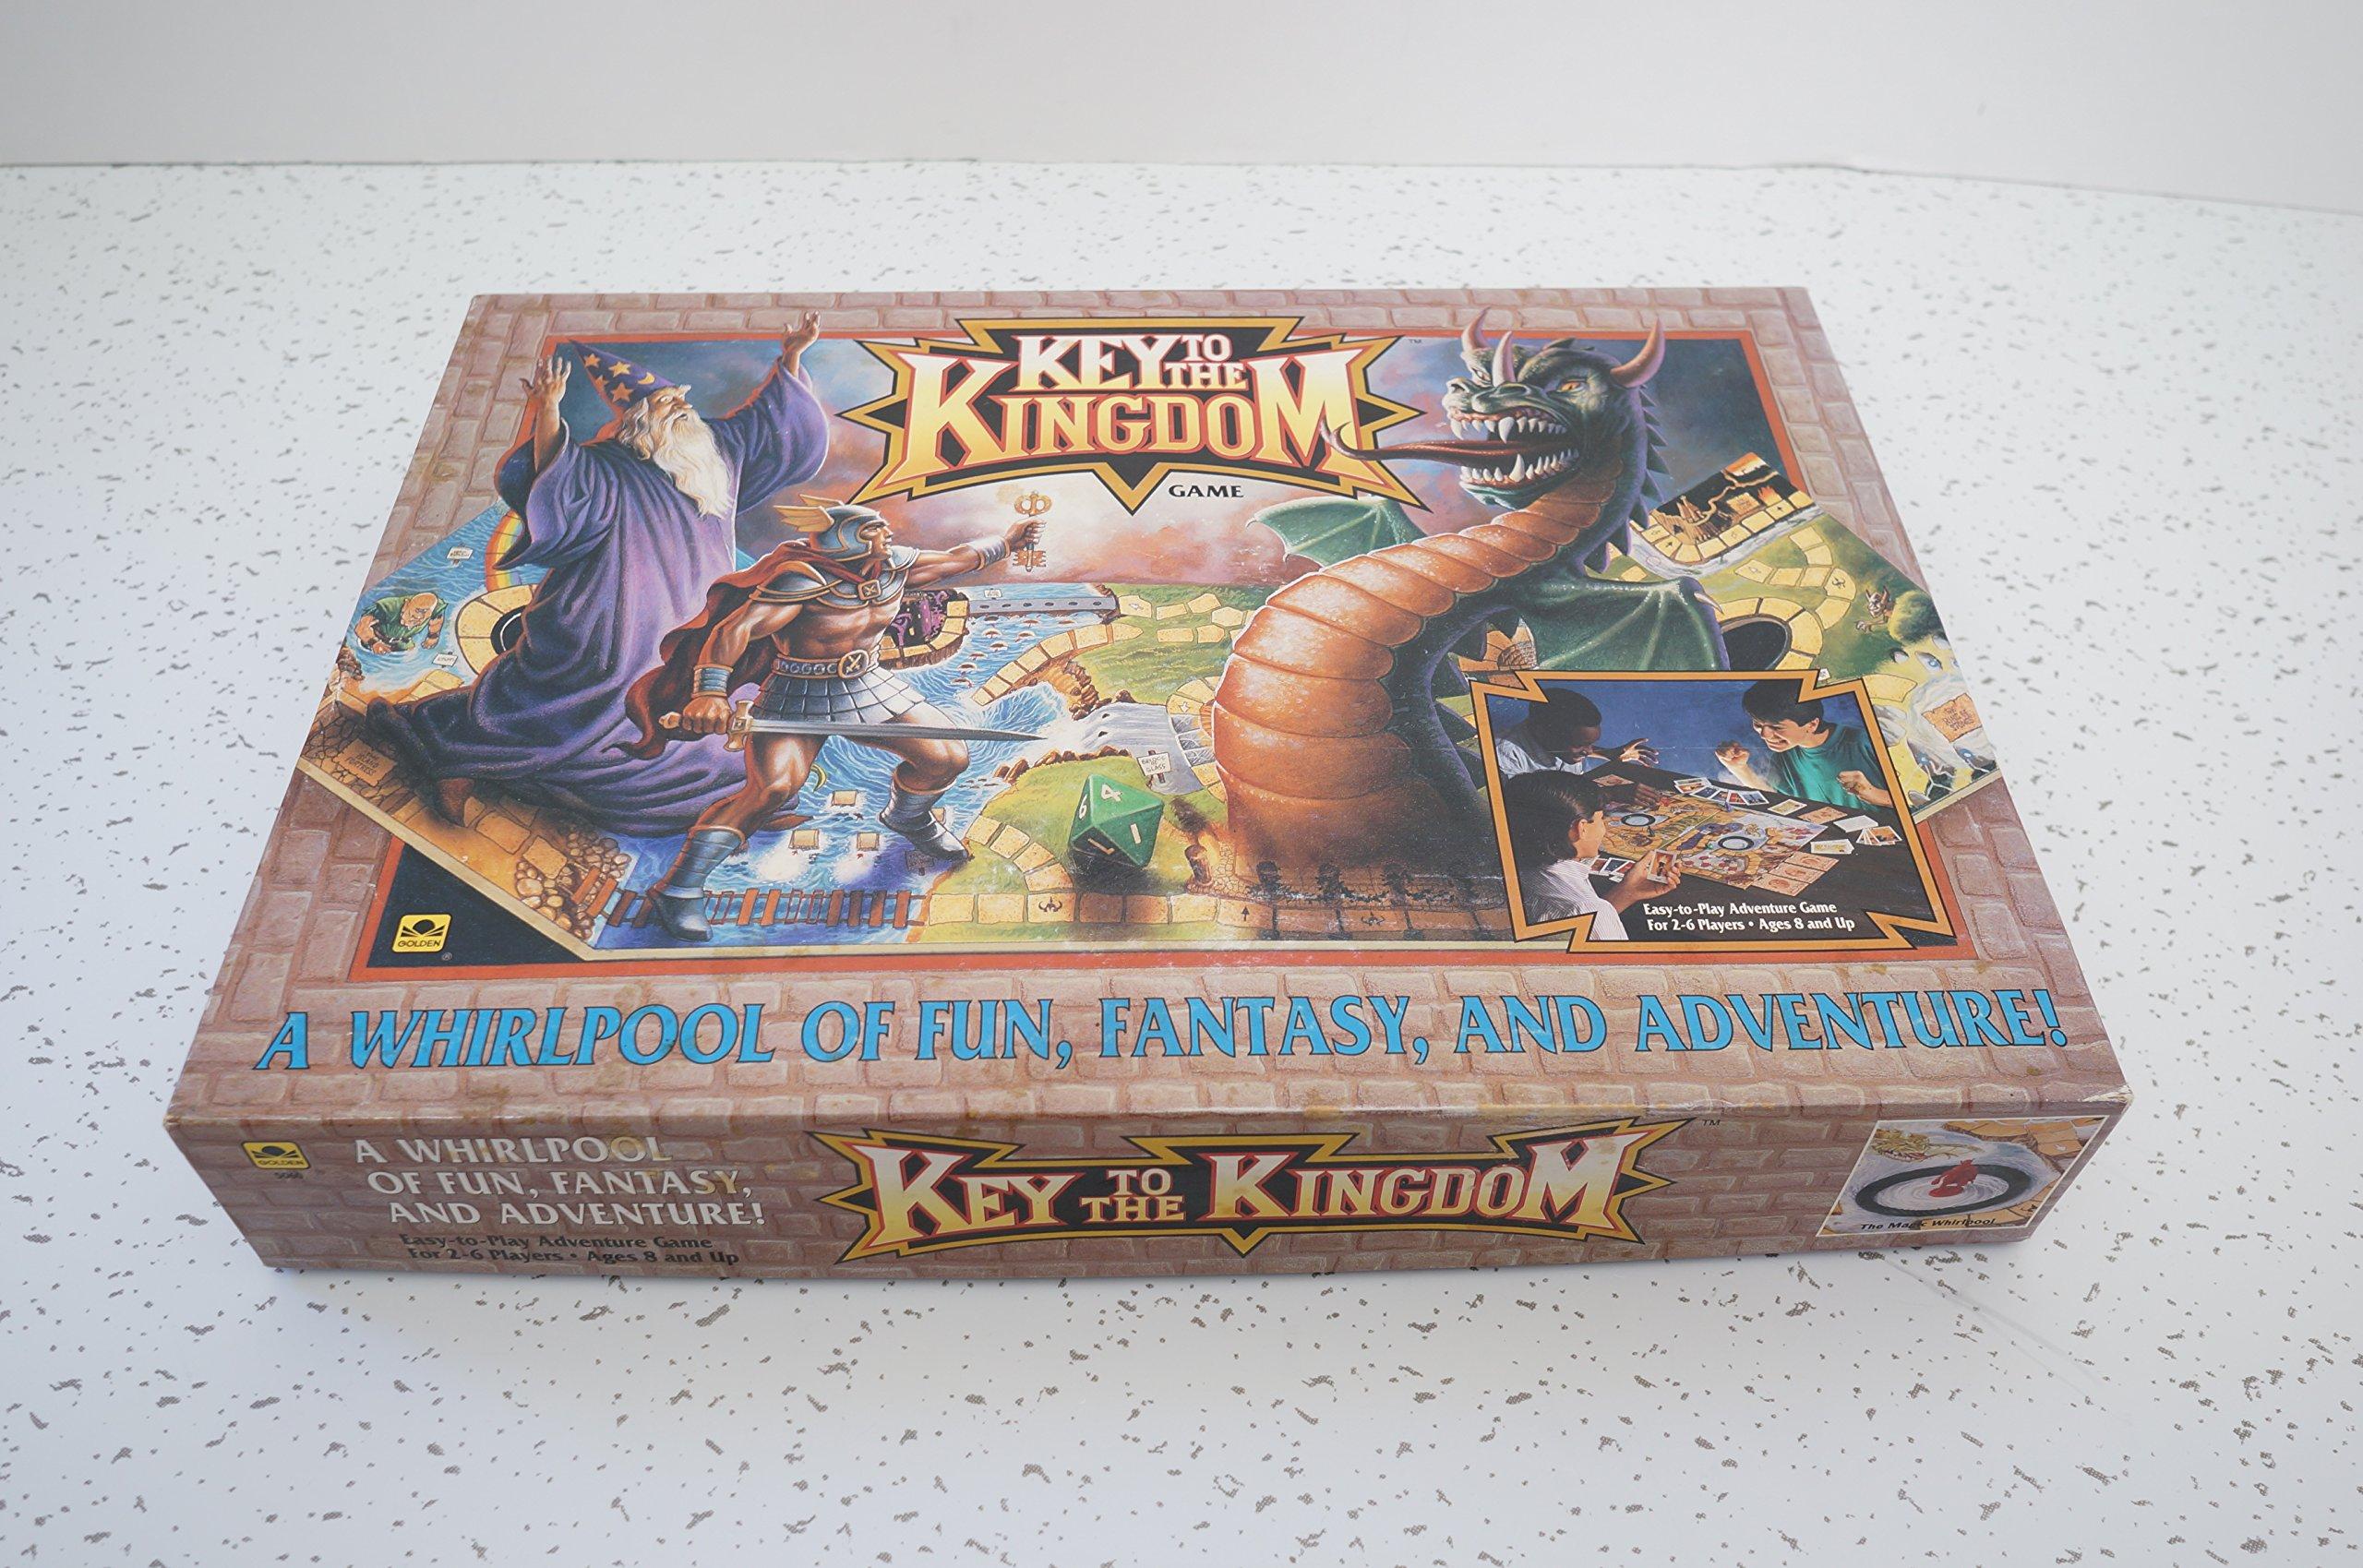 Key to the Kingdom Adventure Board Game - 1992